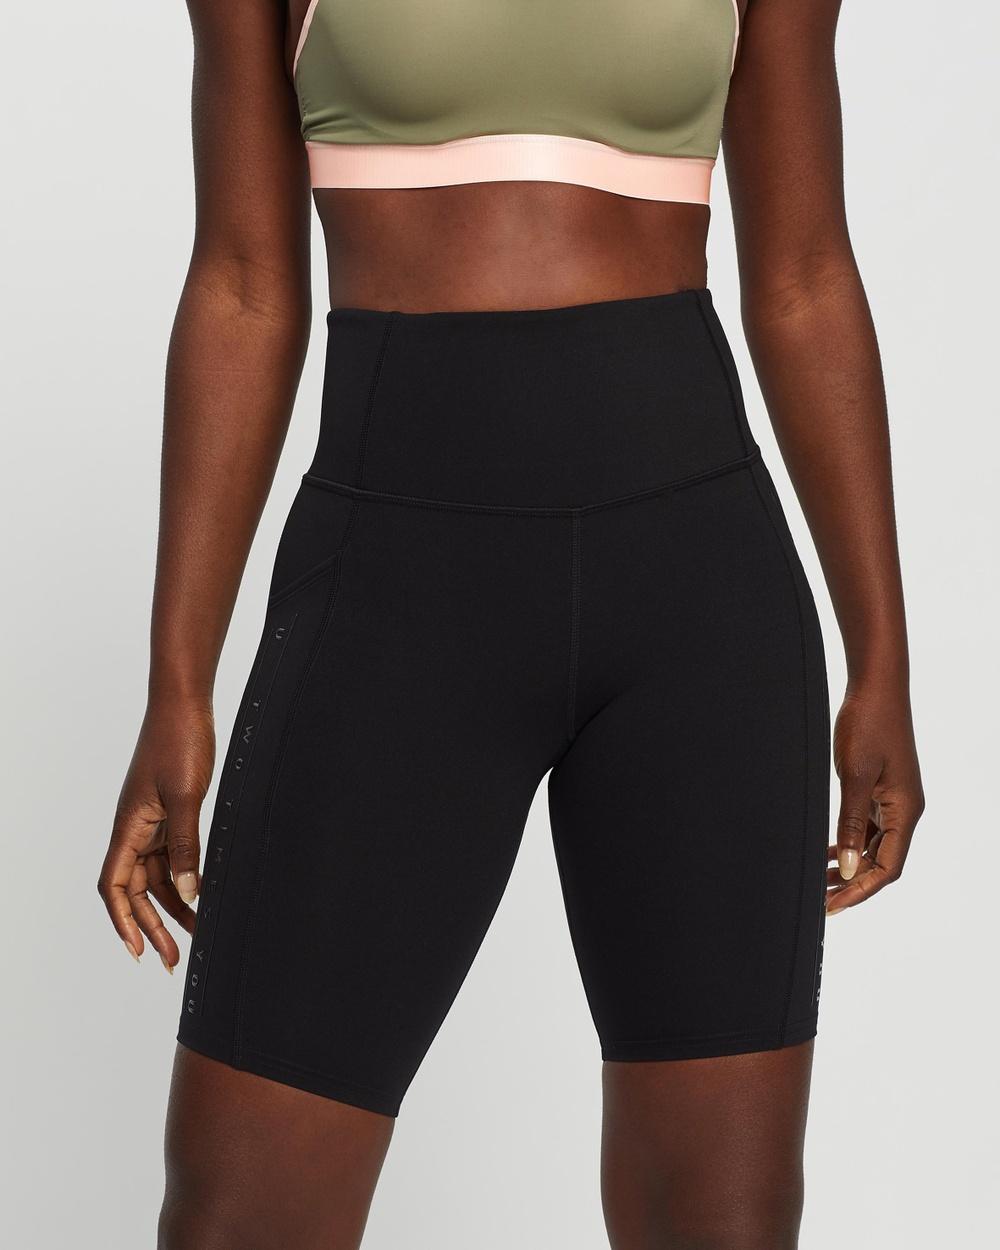 2XU Form Lineup Hi Rise Bike Shorts Sports Tights Black Hi-Rise